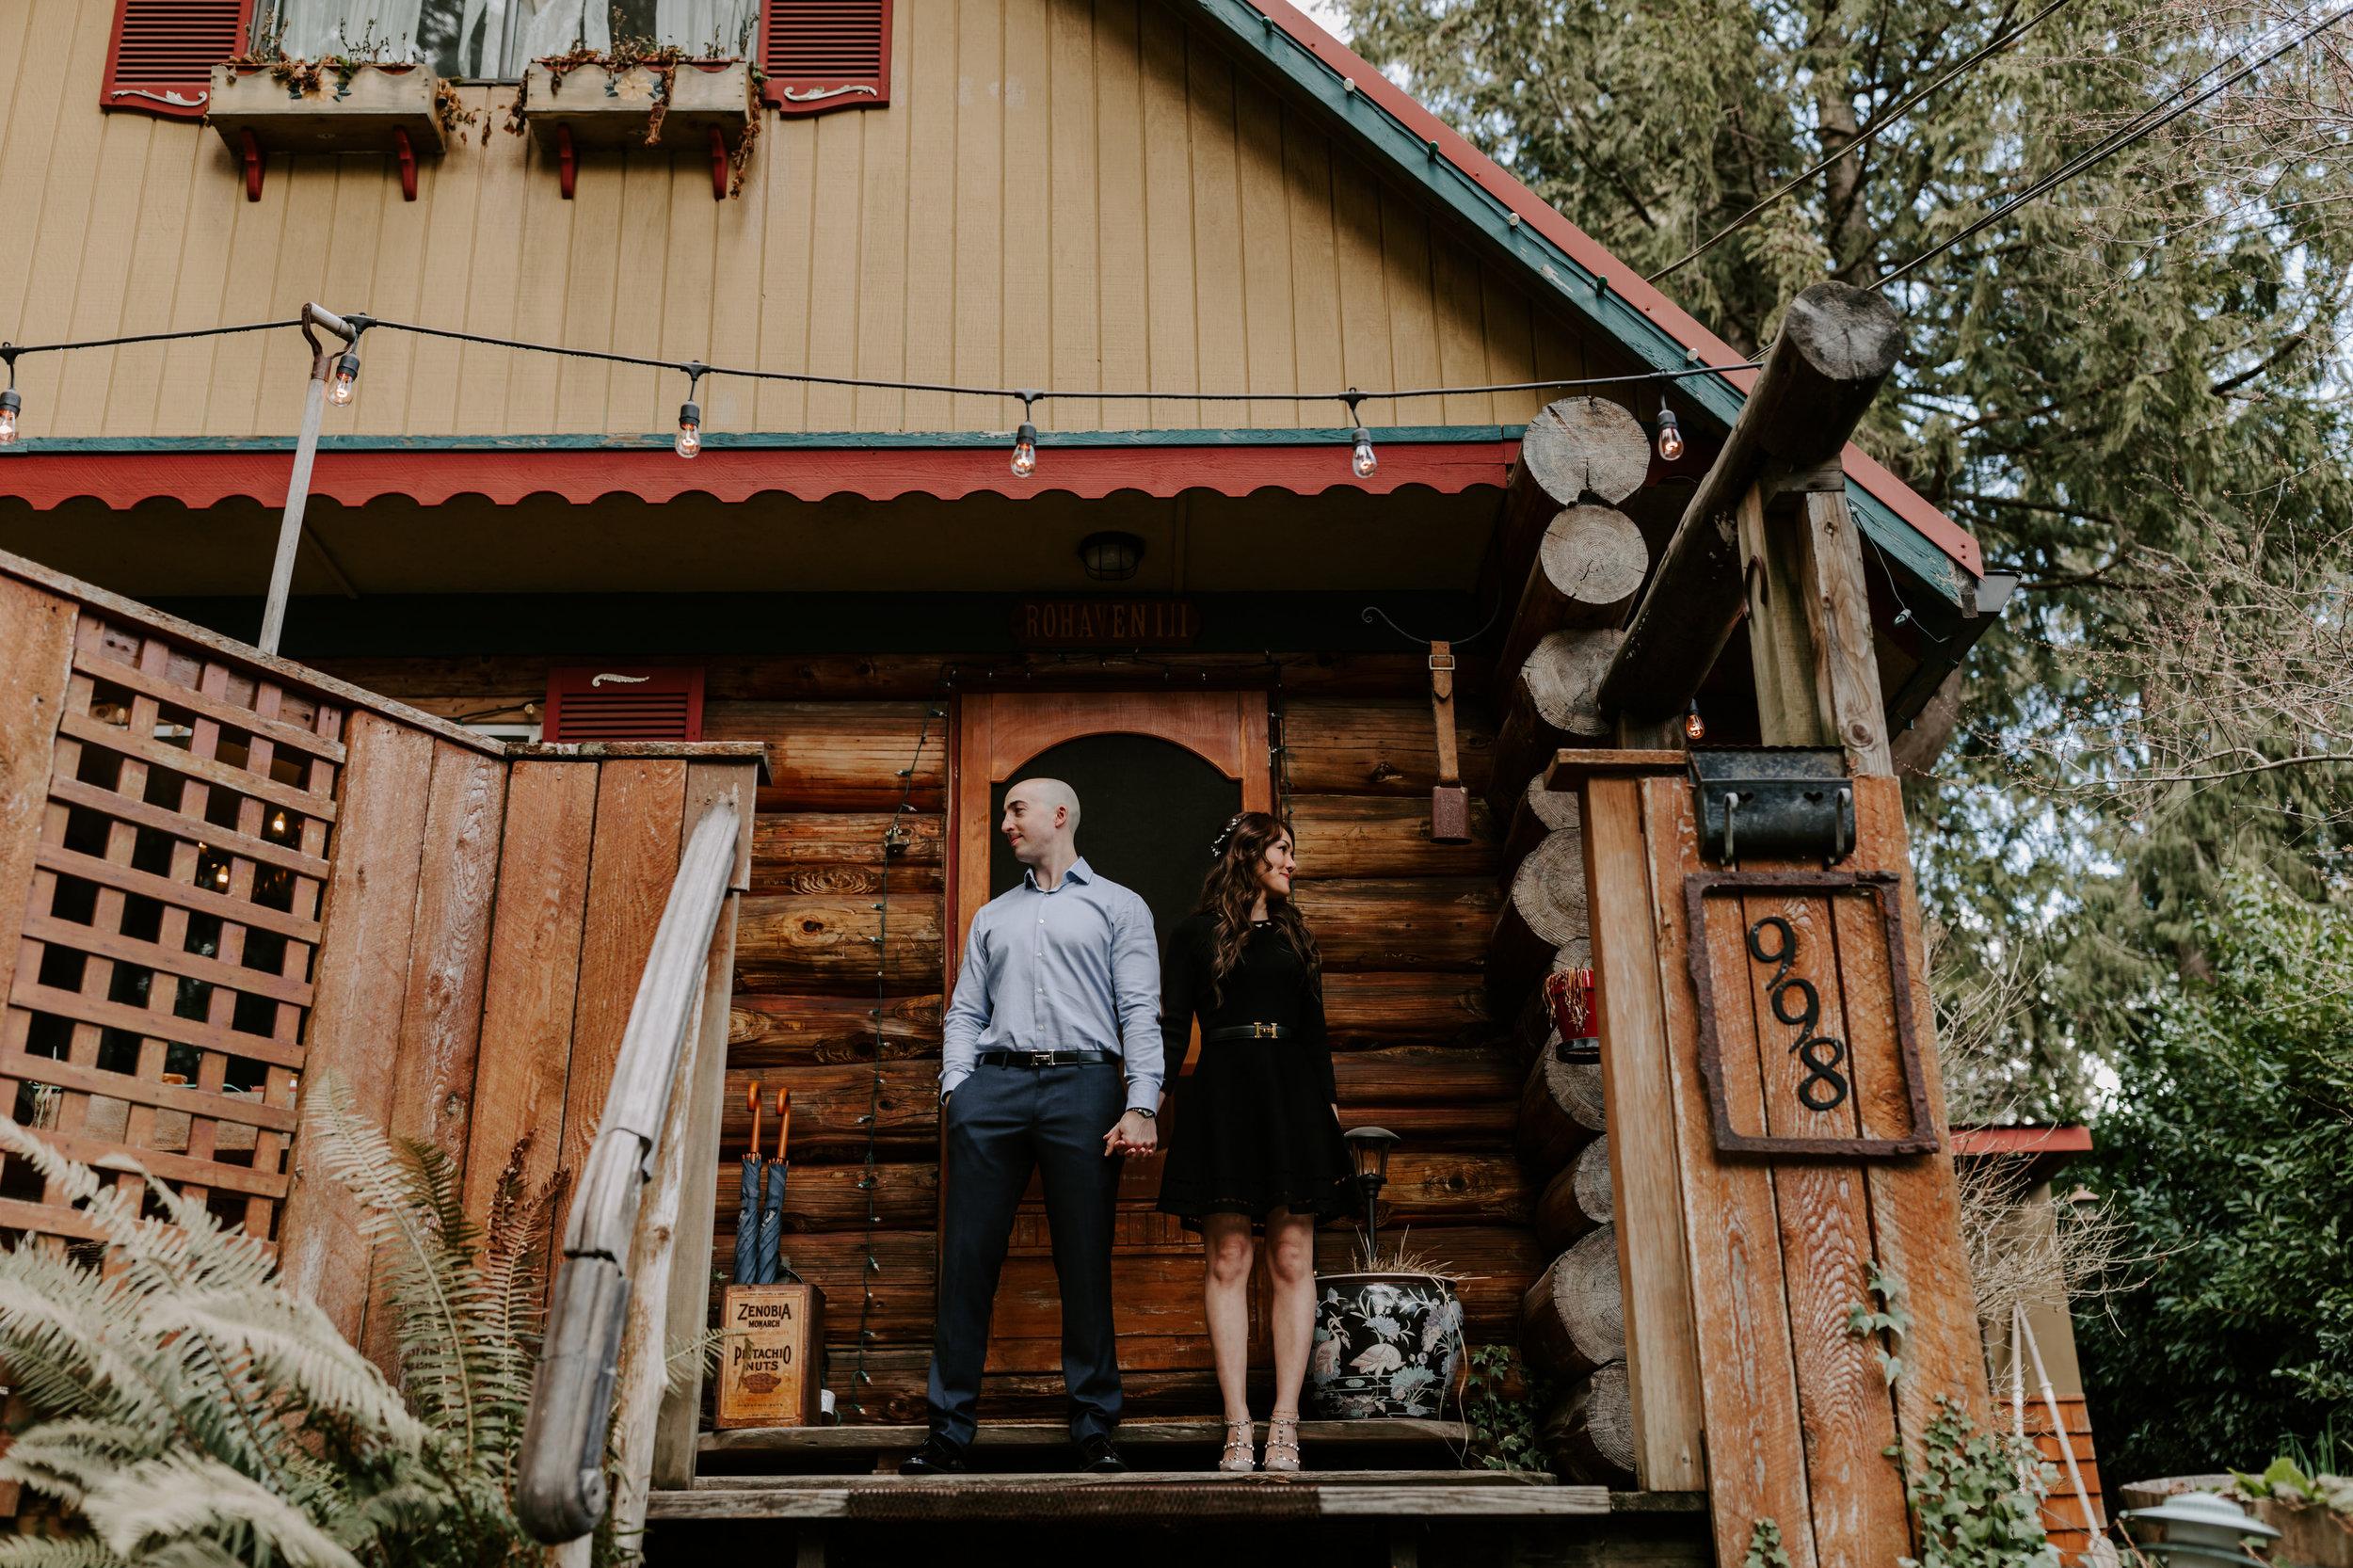 Sunshine Coast Elopement Photos - Forest Wedding - Beach Wedding - Sunshine Coast Wedding Photographer - Vancouver Wedding Photographer - Vancouver Wedding Videographer - 970.JPG